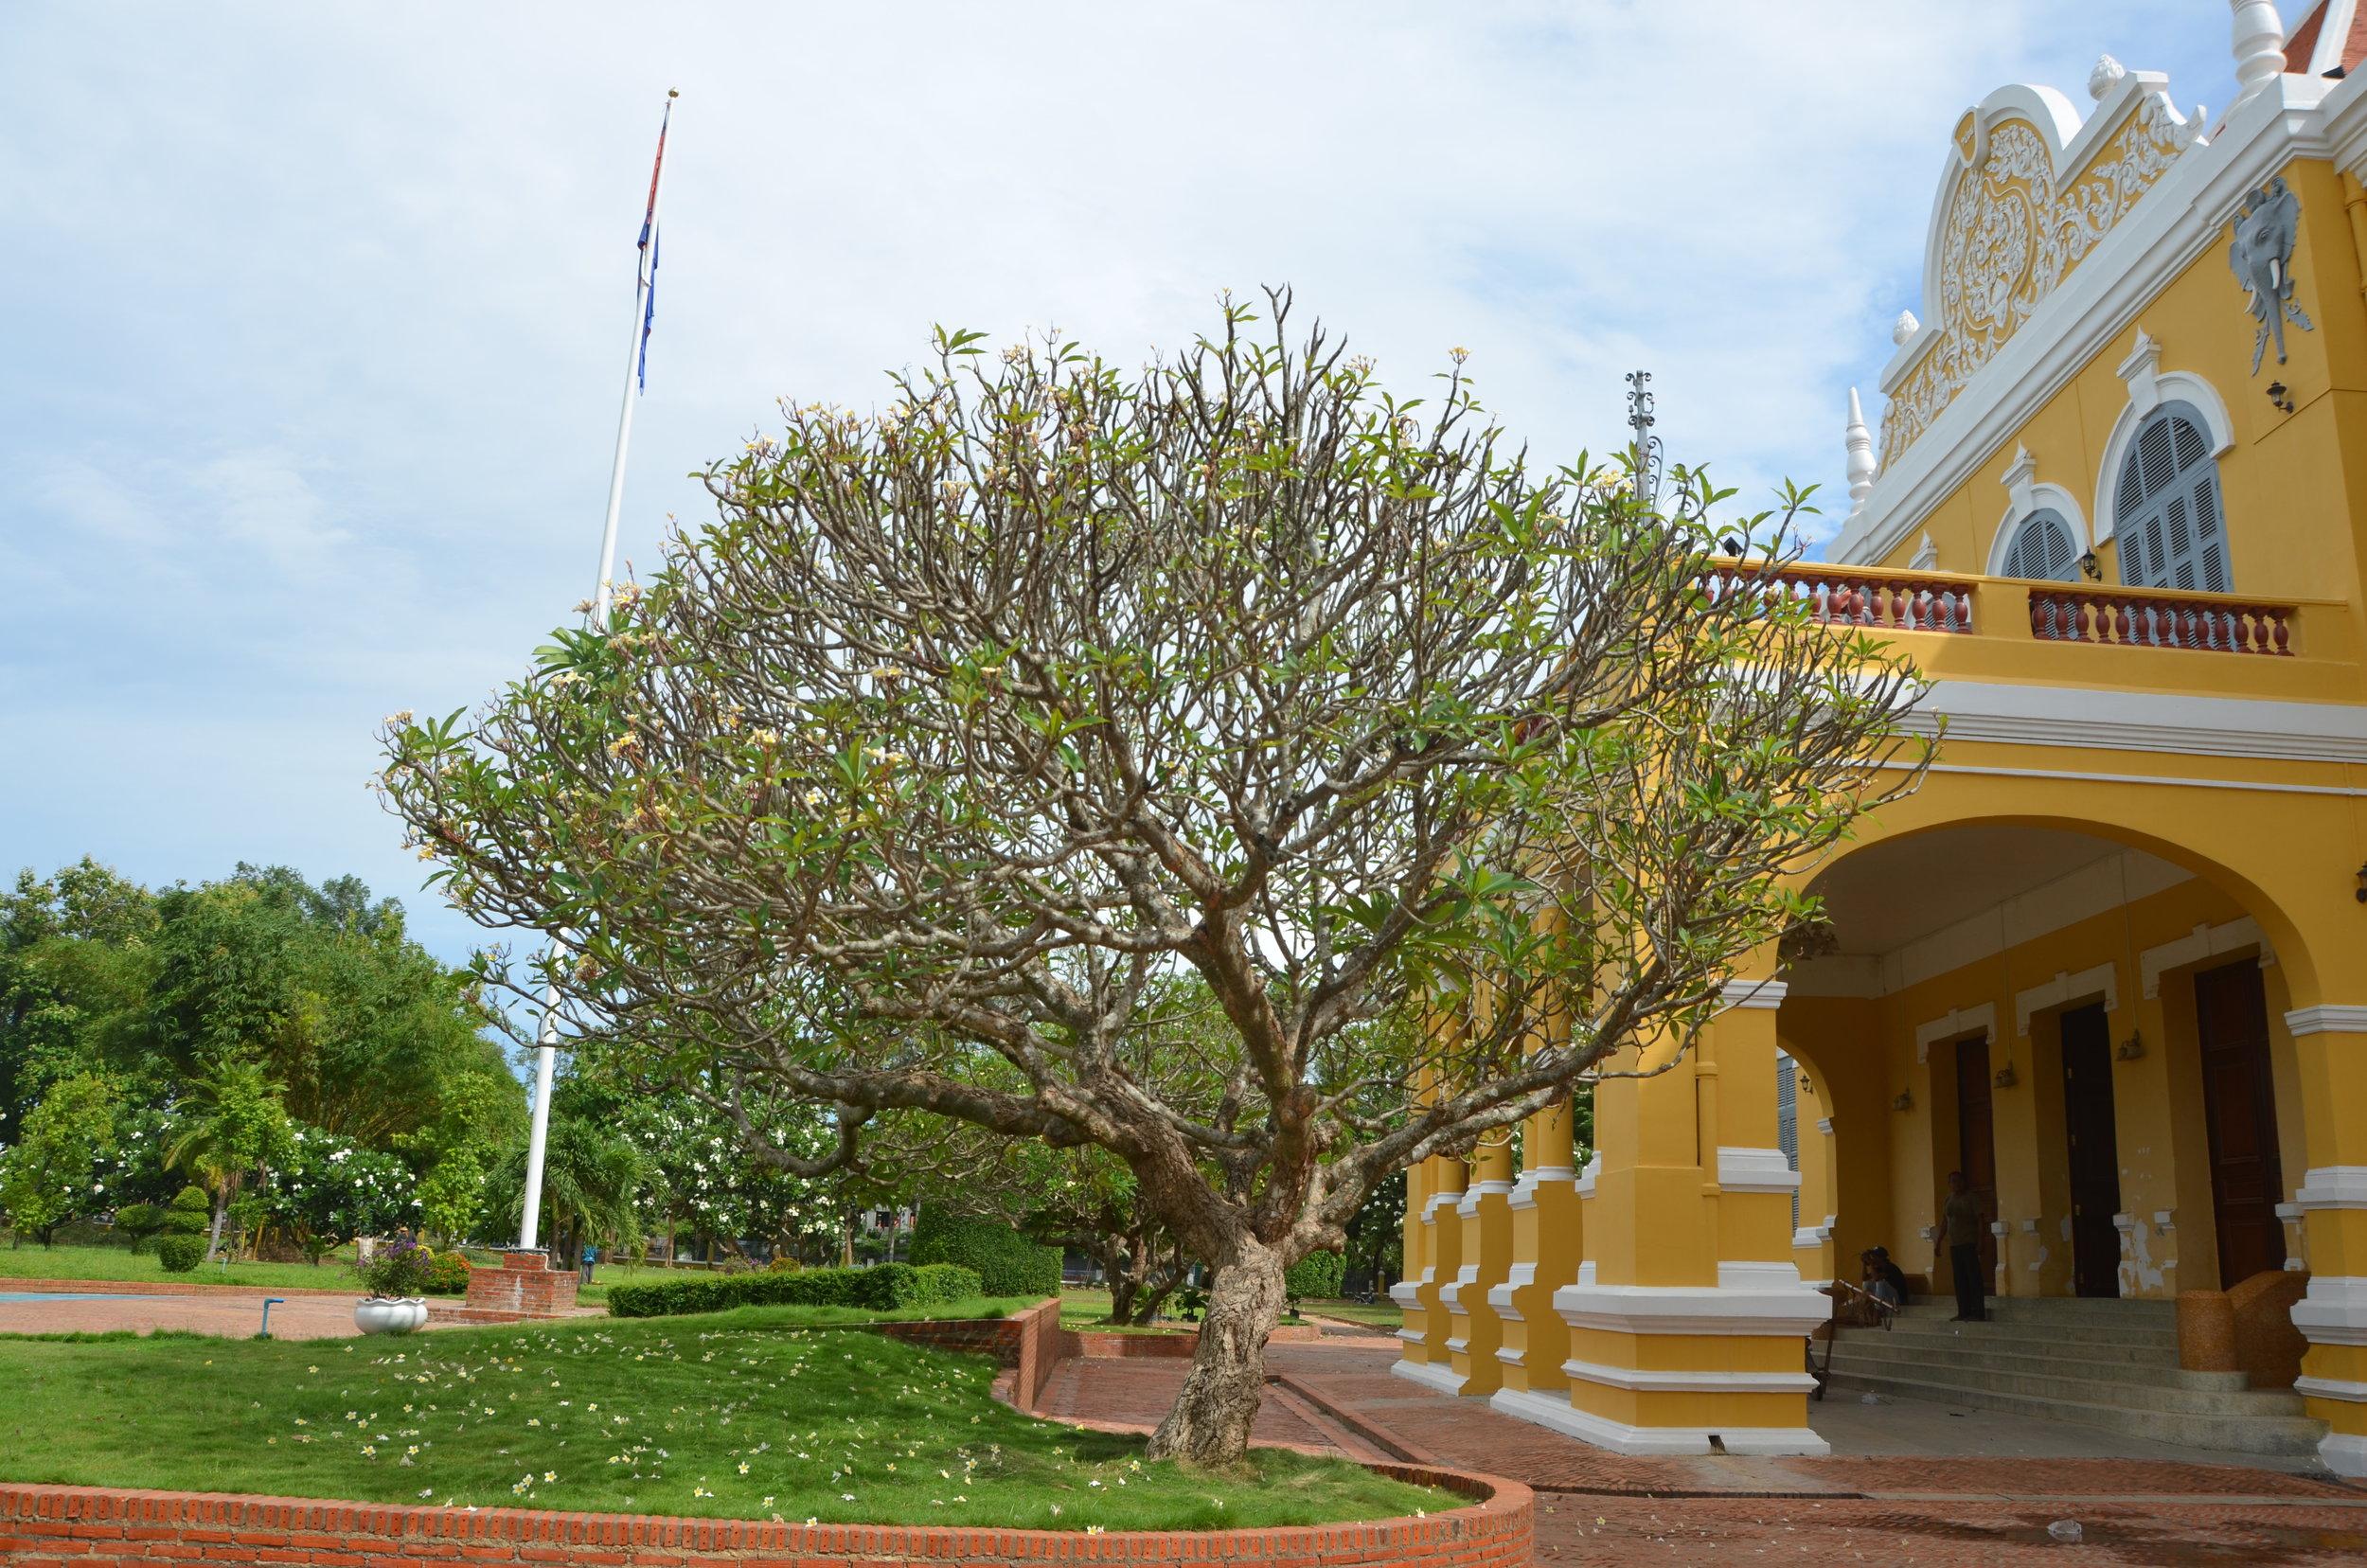 The Provincial House in Battambang